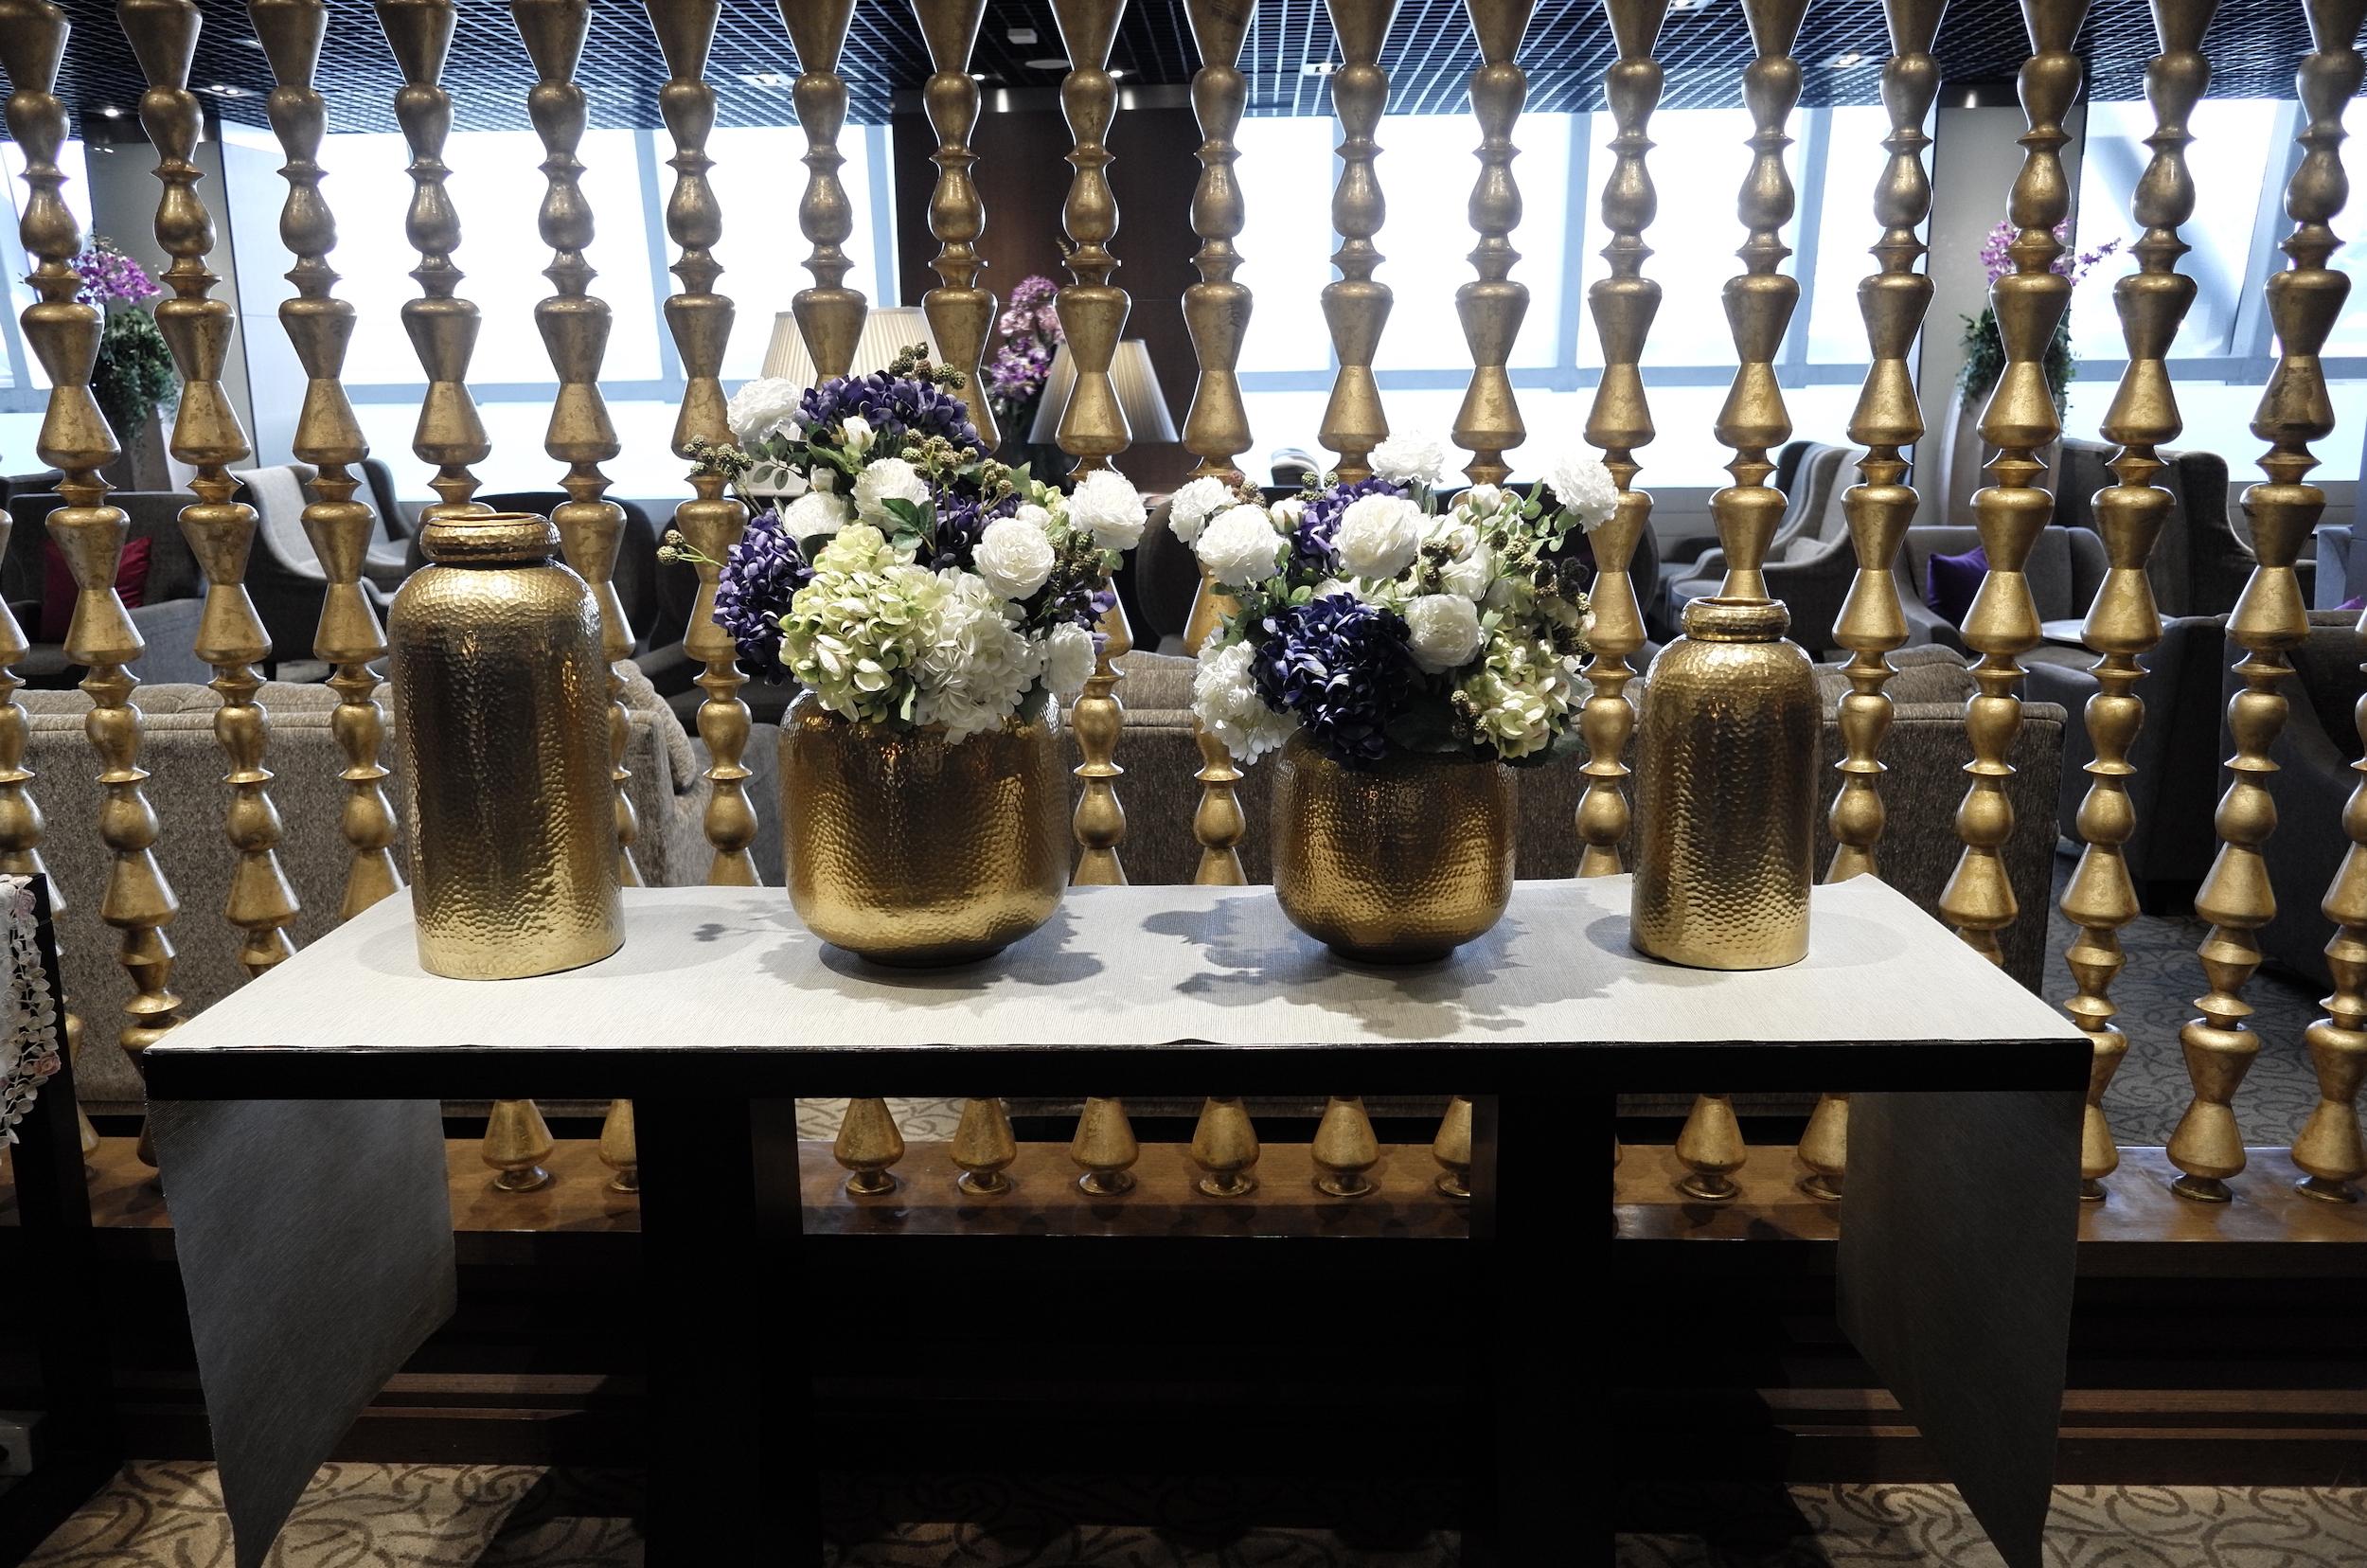 Lounge Review : バンコク・スワンナプーム空港(BKK) タイ国際航空(TG) ロイヤルファーストラウンジ(Royal First Lounge)